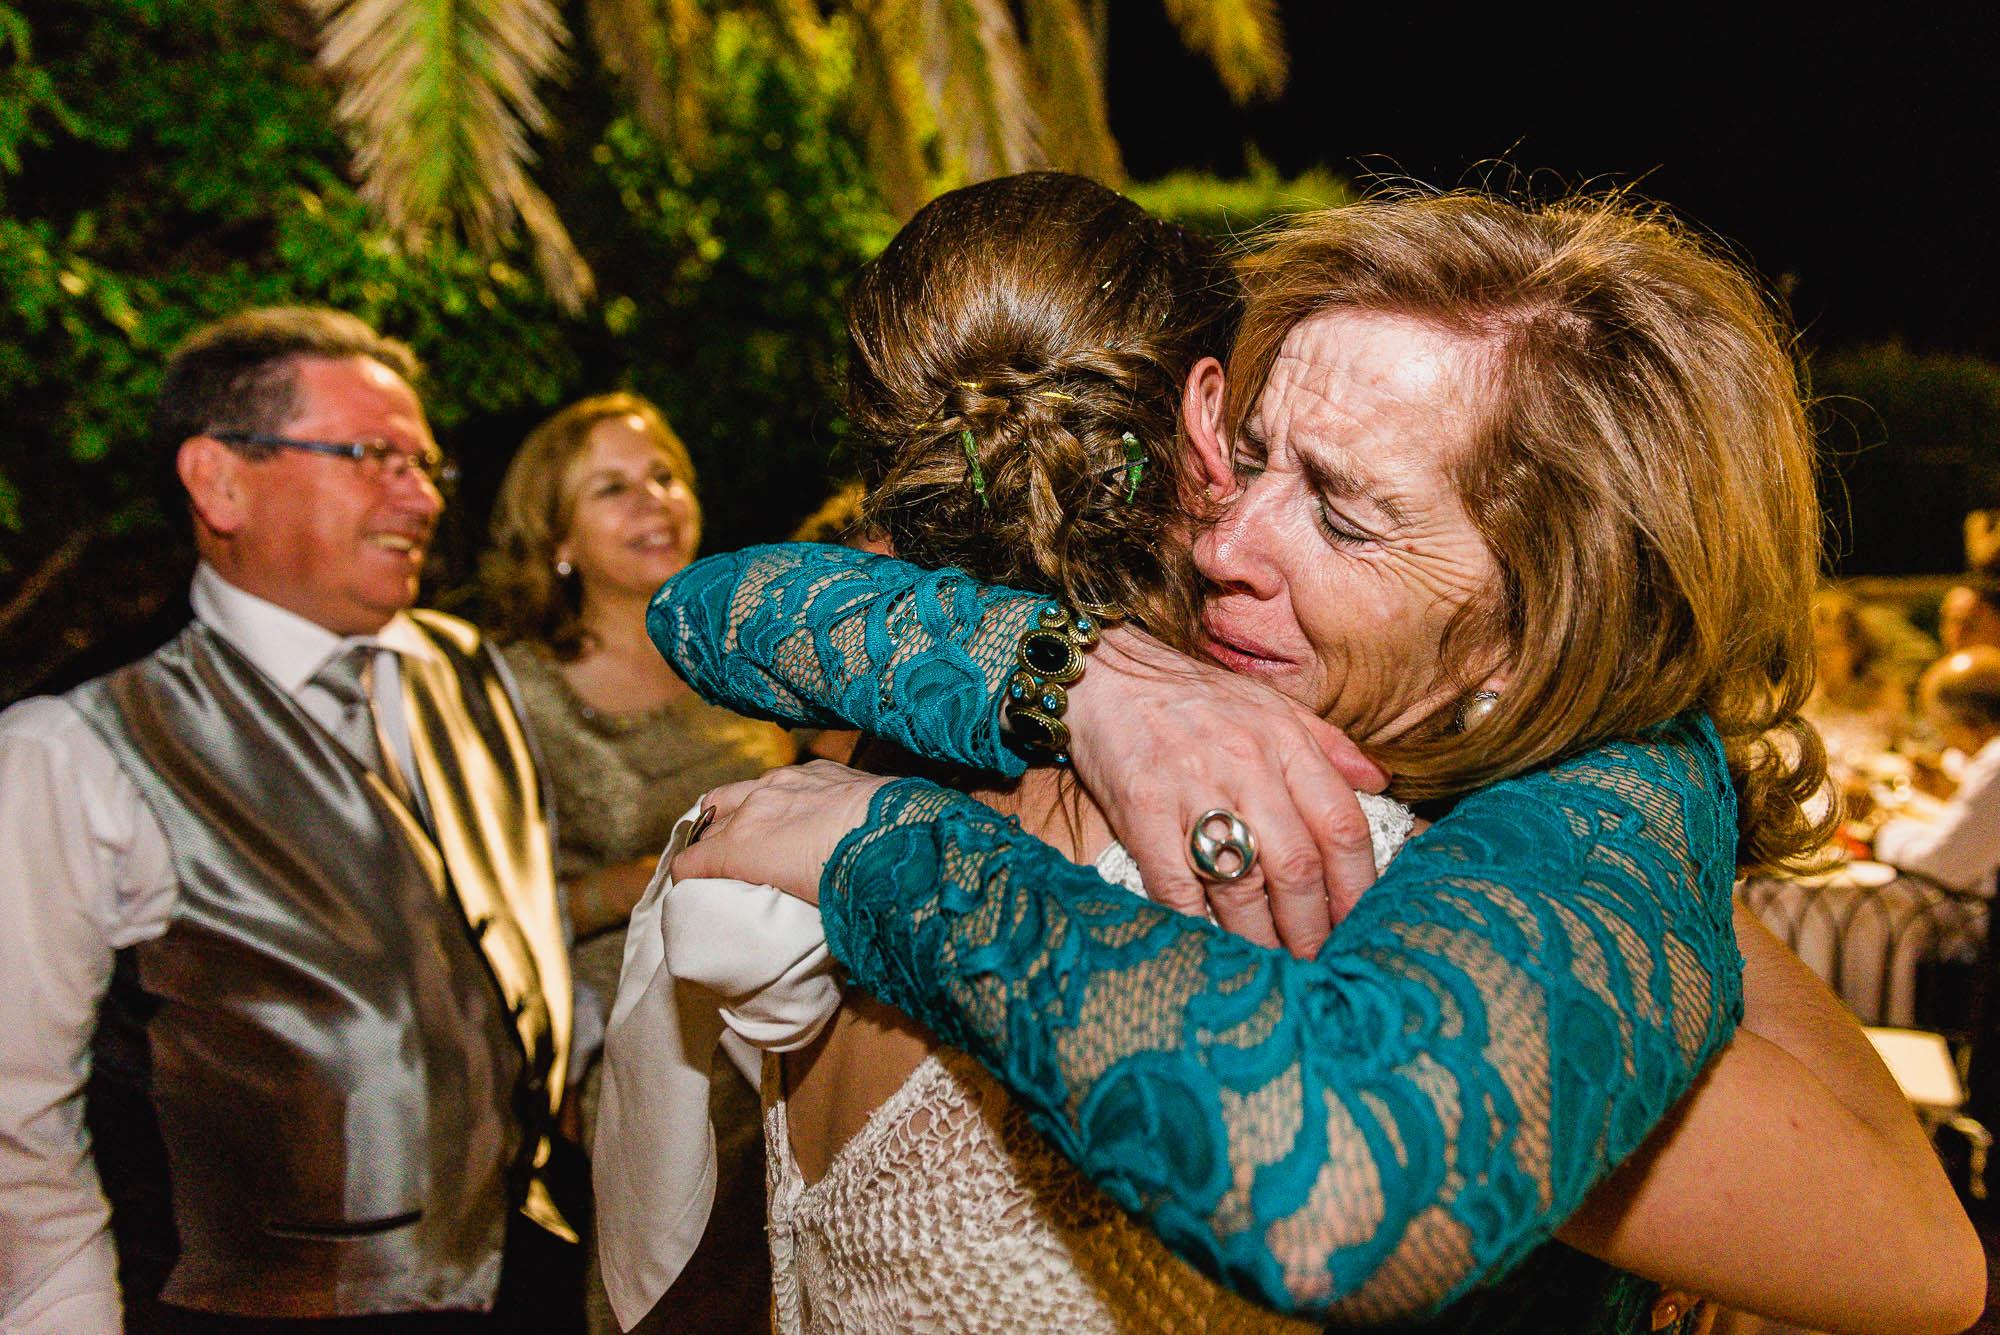 fotografos de boda diferentes, capturamos emociones